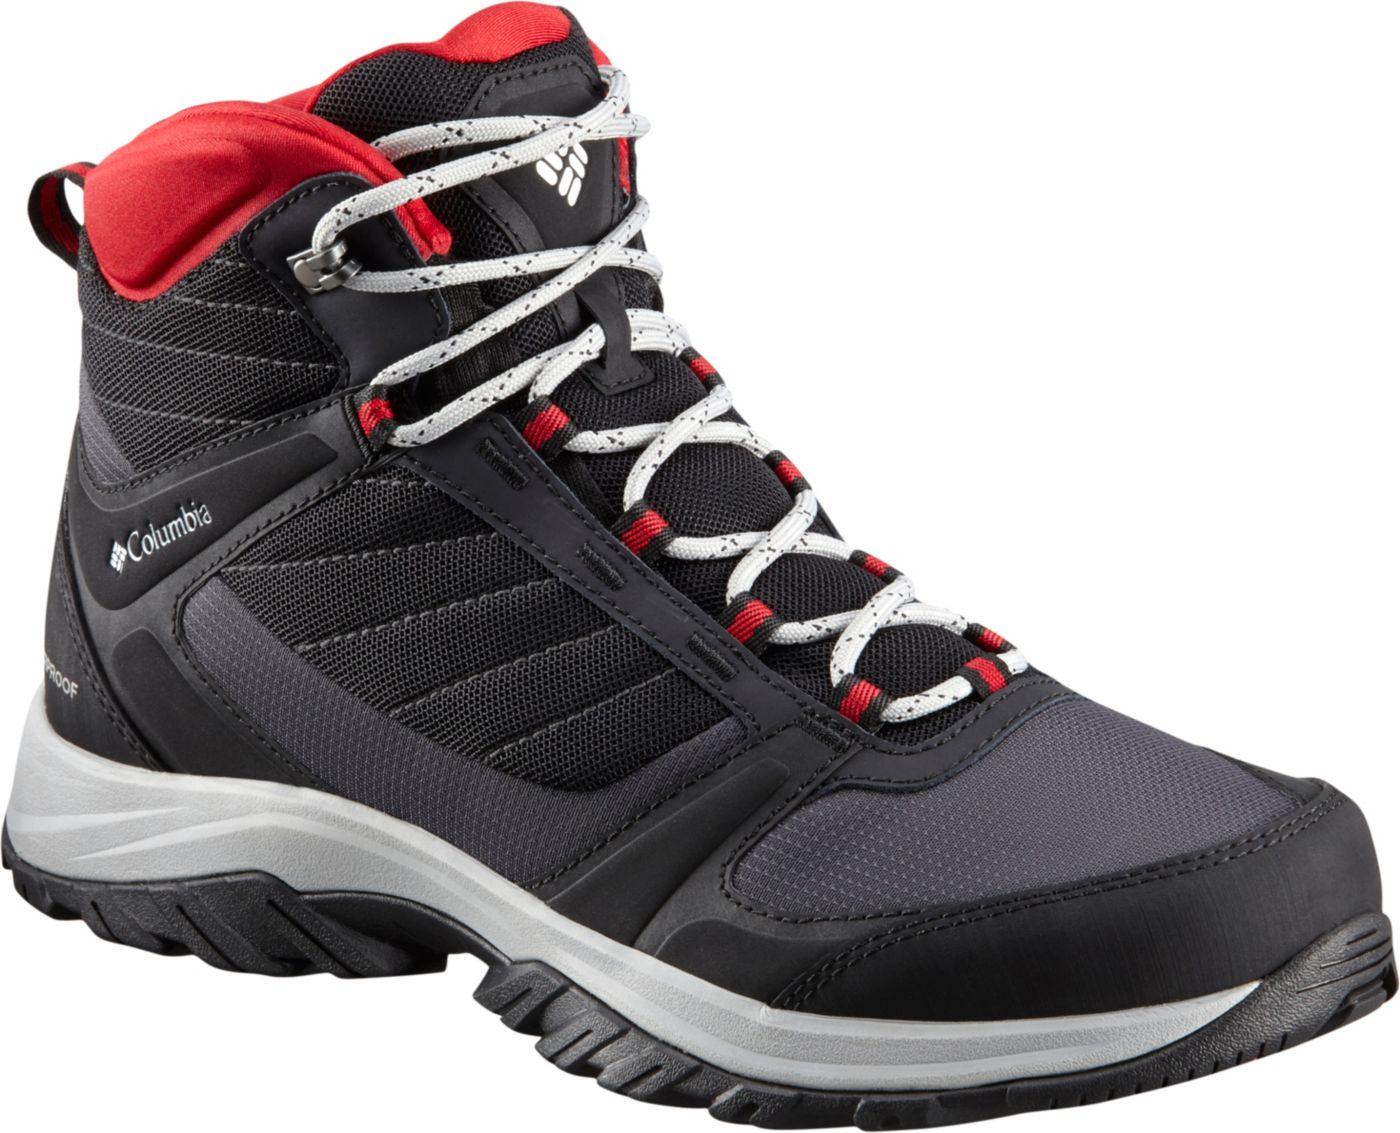 Columbia Men's Terrebonne II Sport Mid Hiking Boots